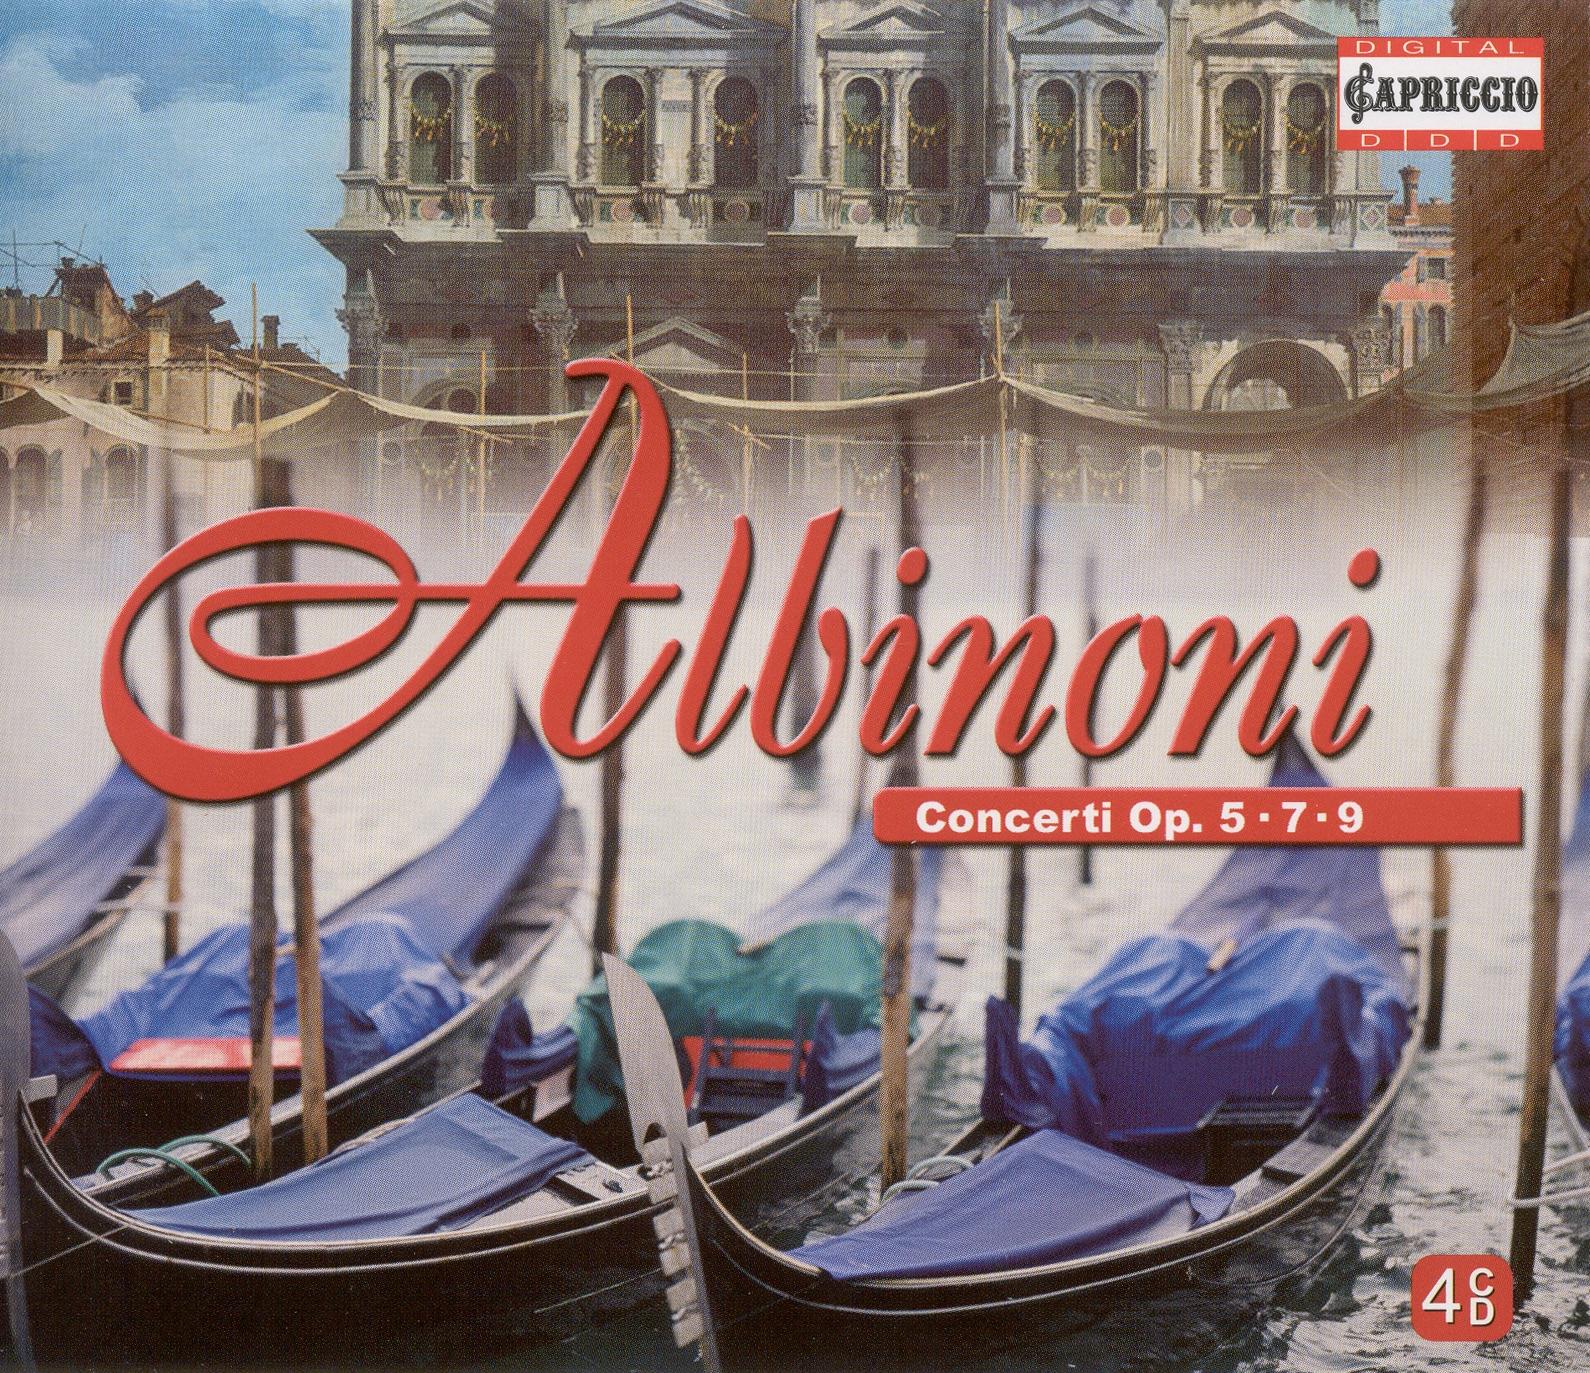 Albinoni, T.G.: Concertos, Opp. 5, 7 and 9